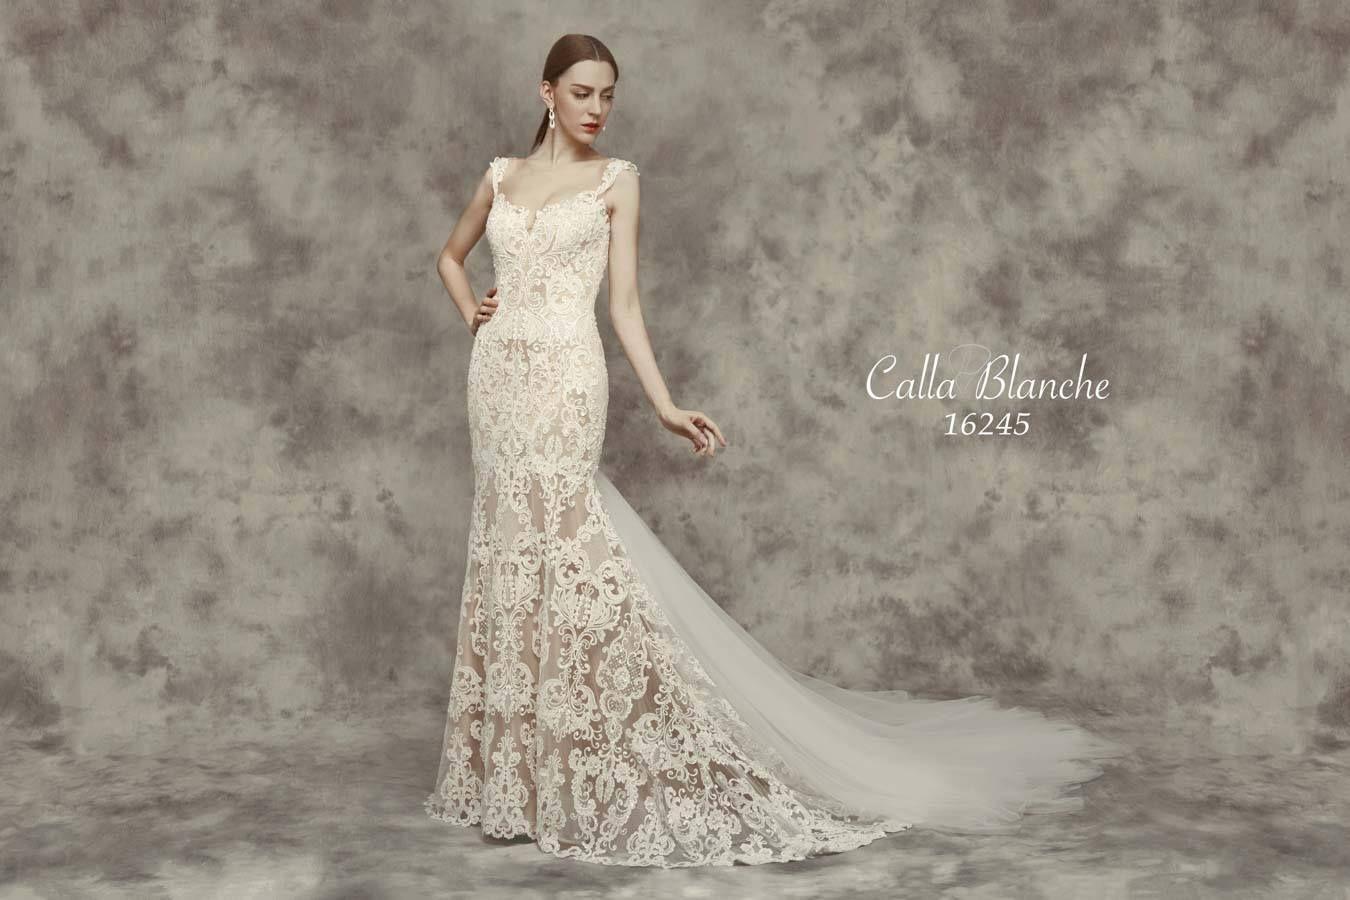 Chloe Wedding Dress Style 16245   Calla Blanche Bridal   Calla ...